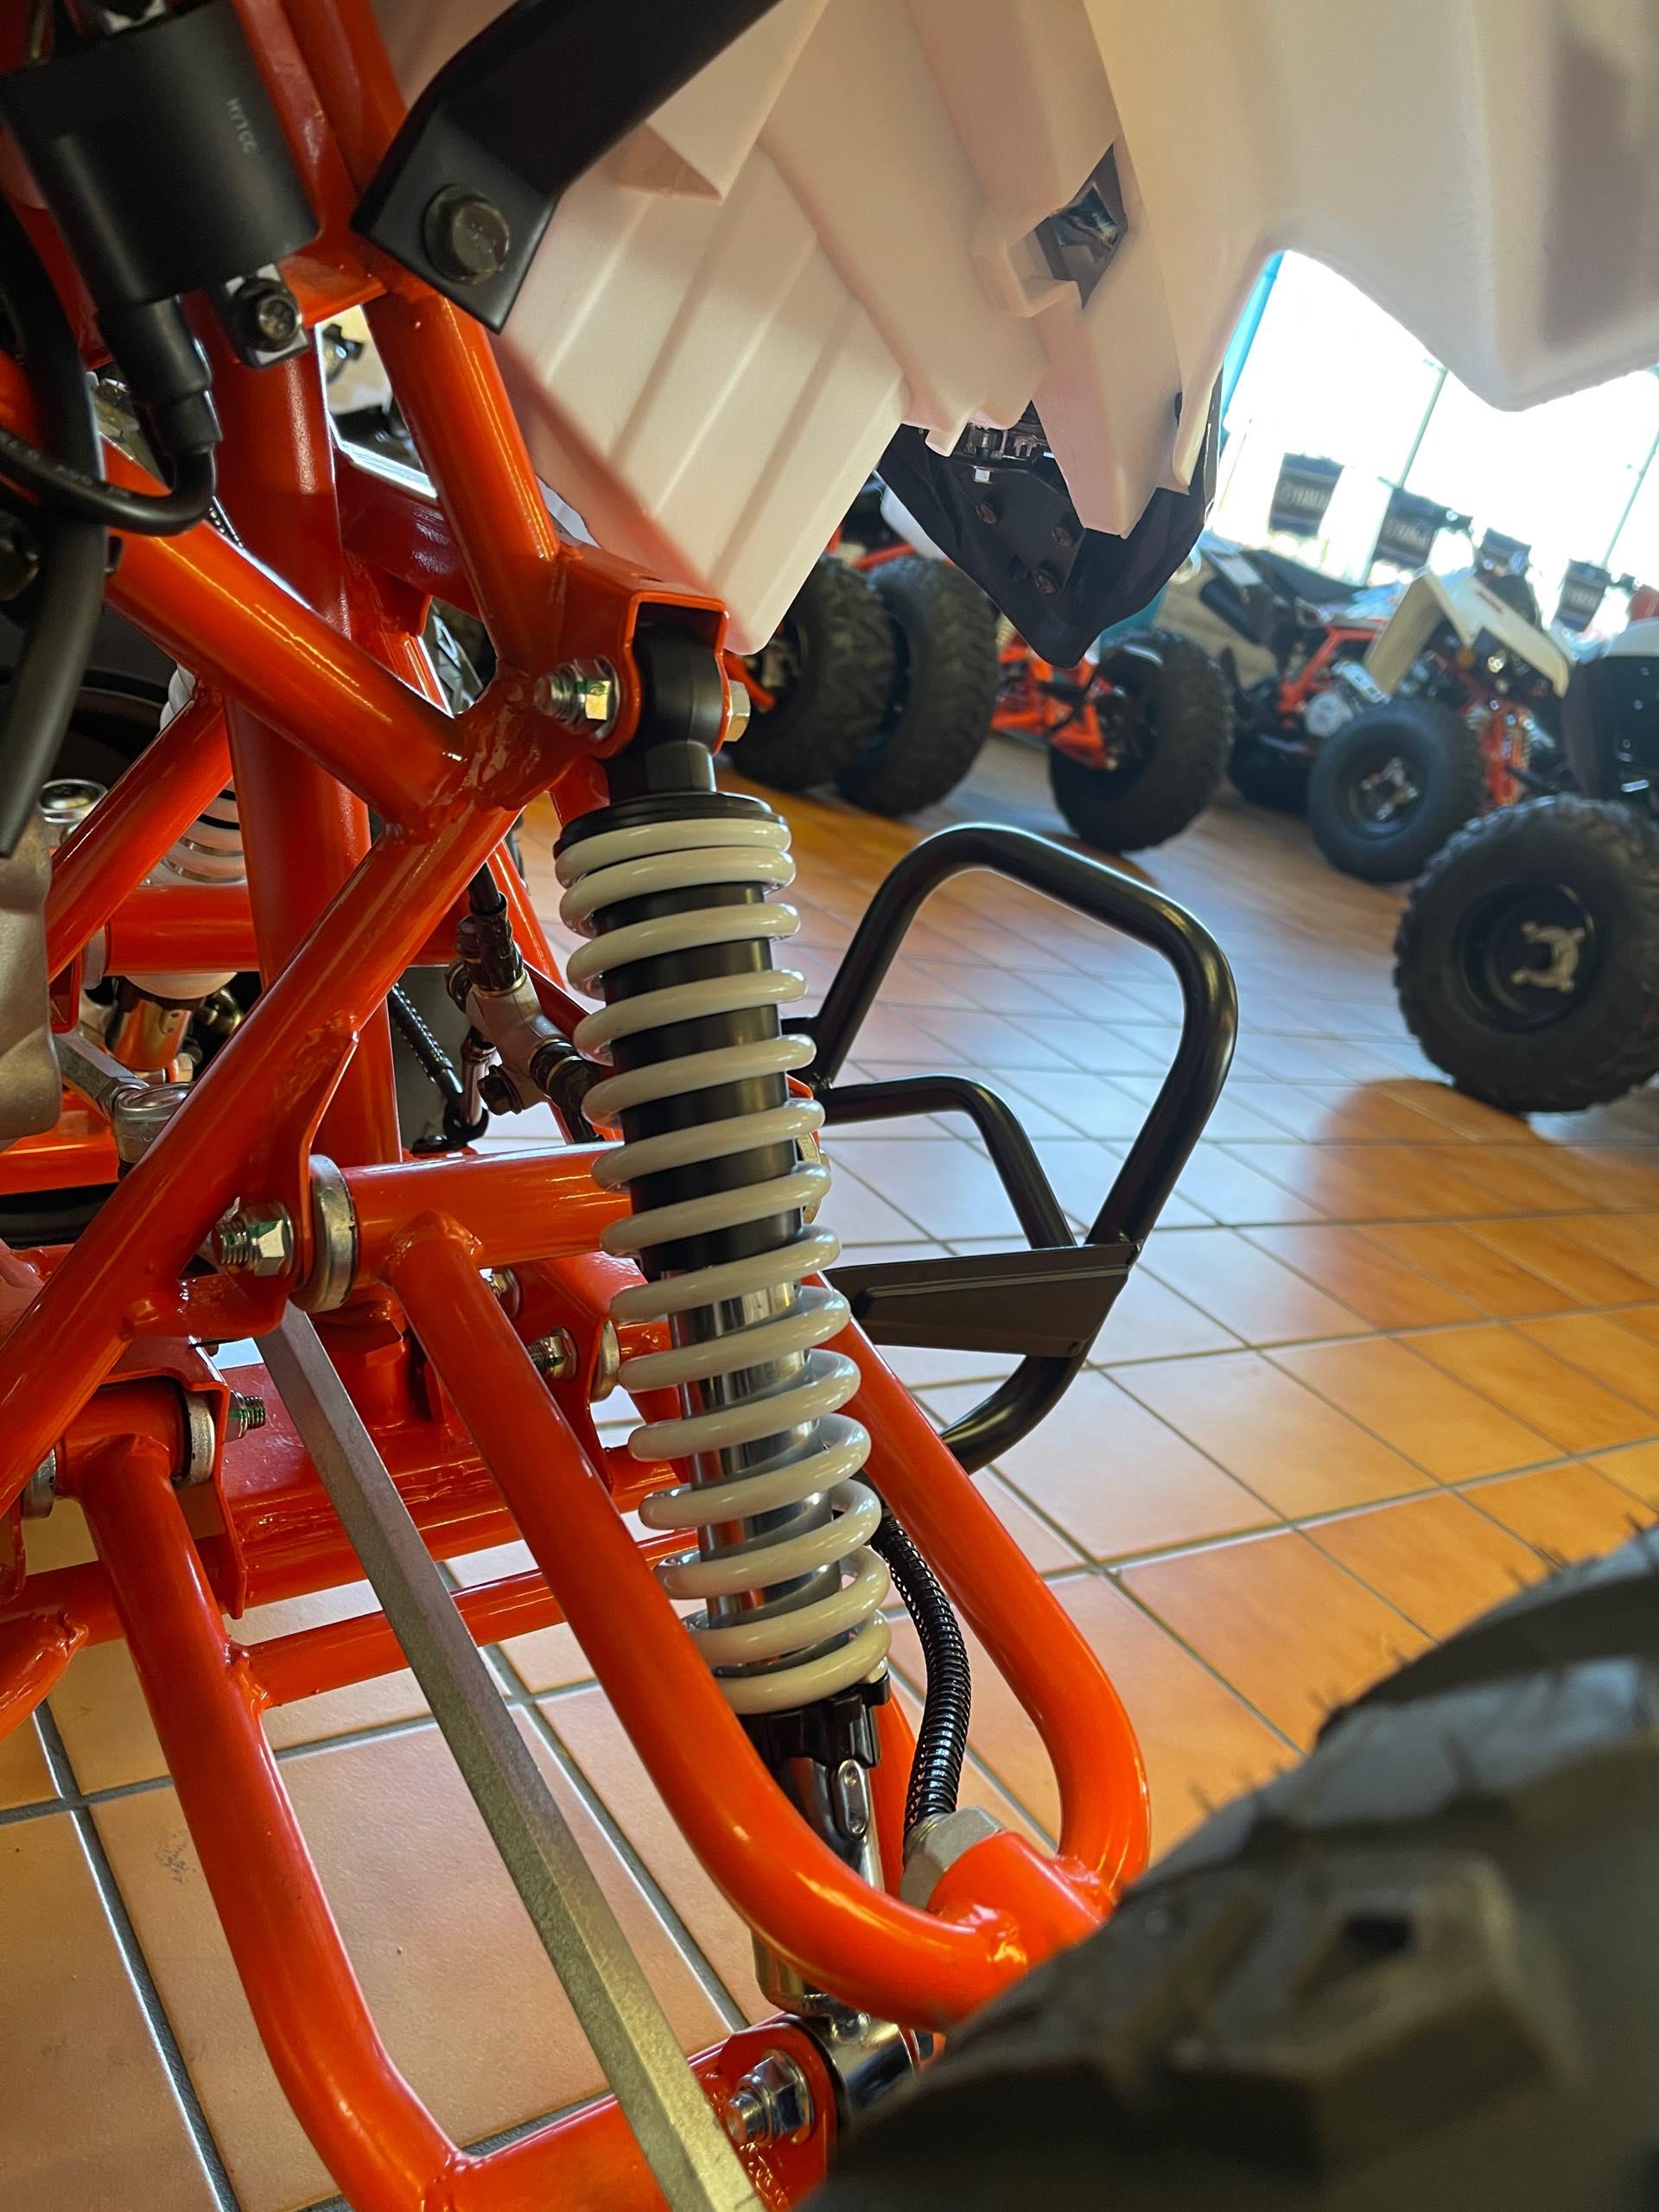 2021 Kayo STORM 180 at Bobby J's Yamaha, Albuquerque, NM 87110